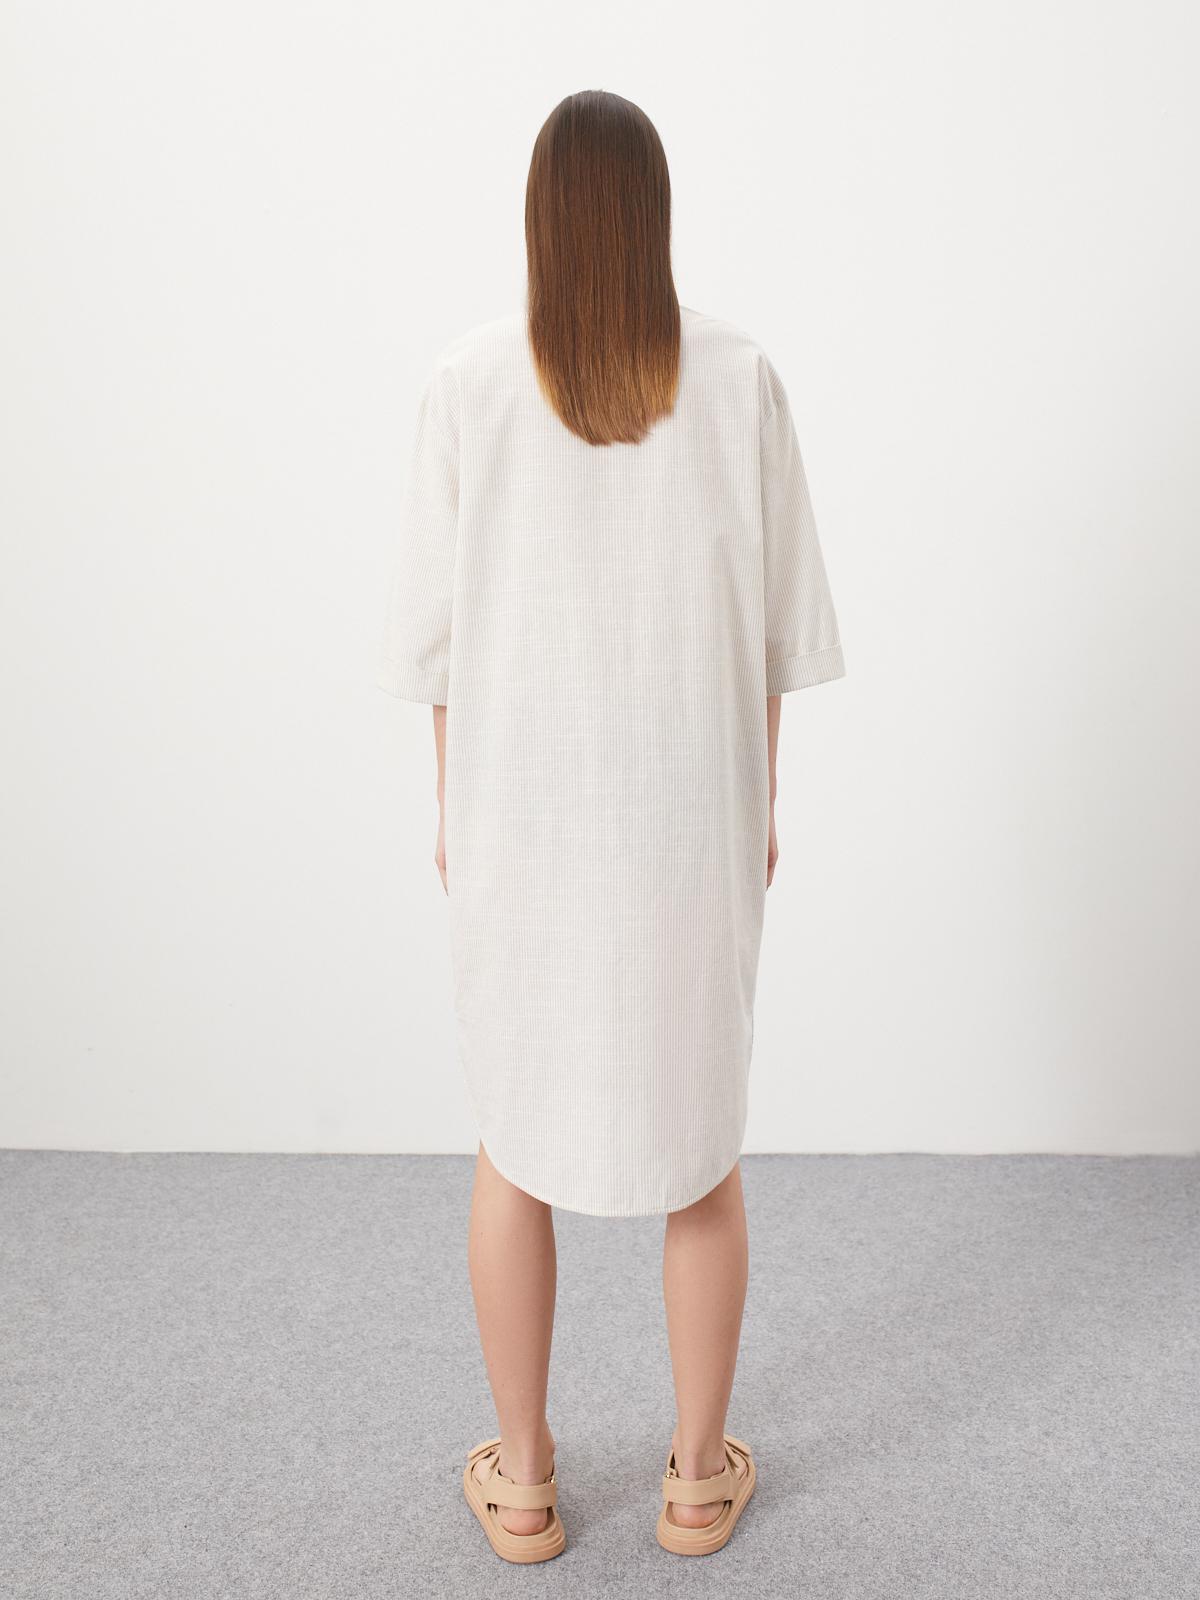 Платье-рубашка Bram с большим карманом, Светло-бежевый